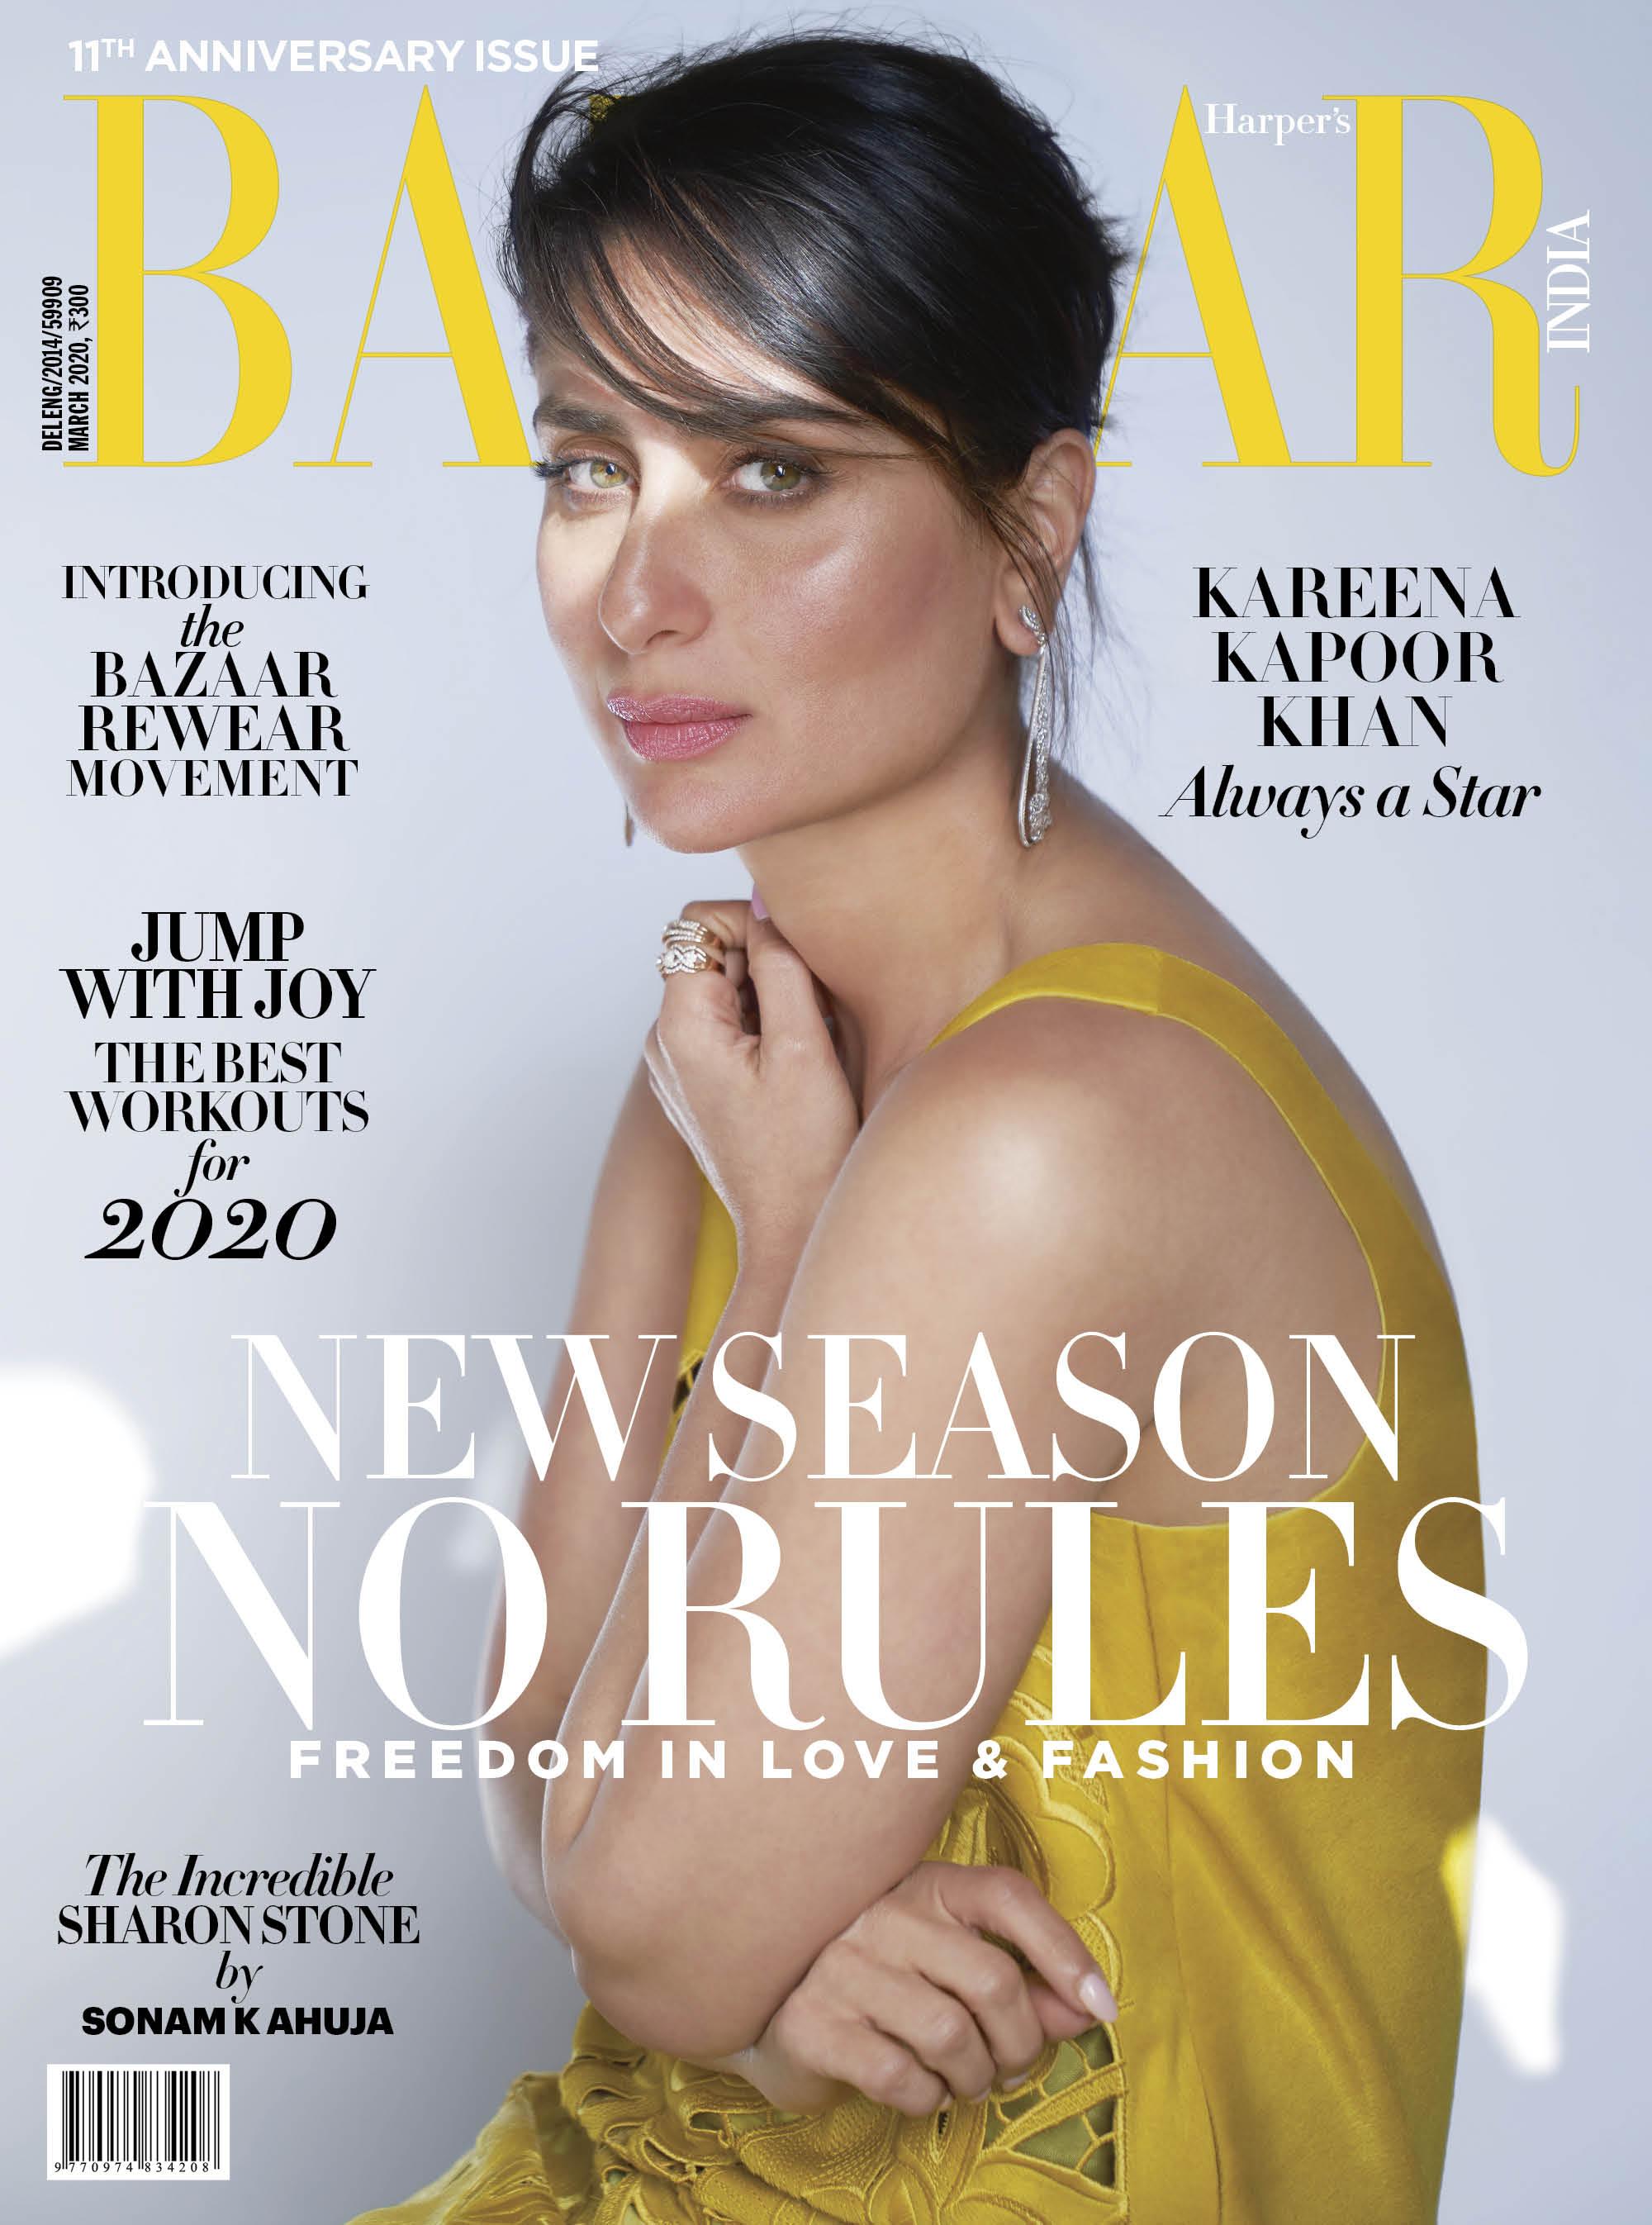 Kareena Kapoor Khan dazzles in stunning summer wear for Harper's Bazaar  India shoot. All pics | IndiaToday